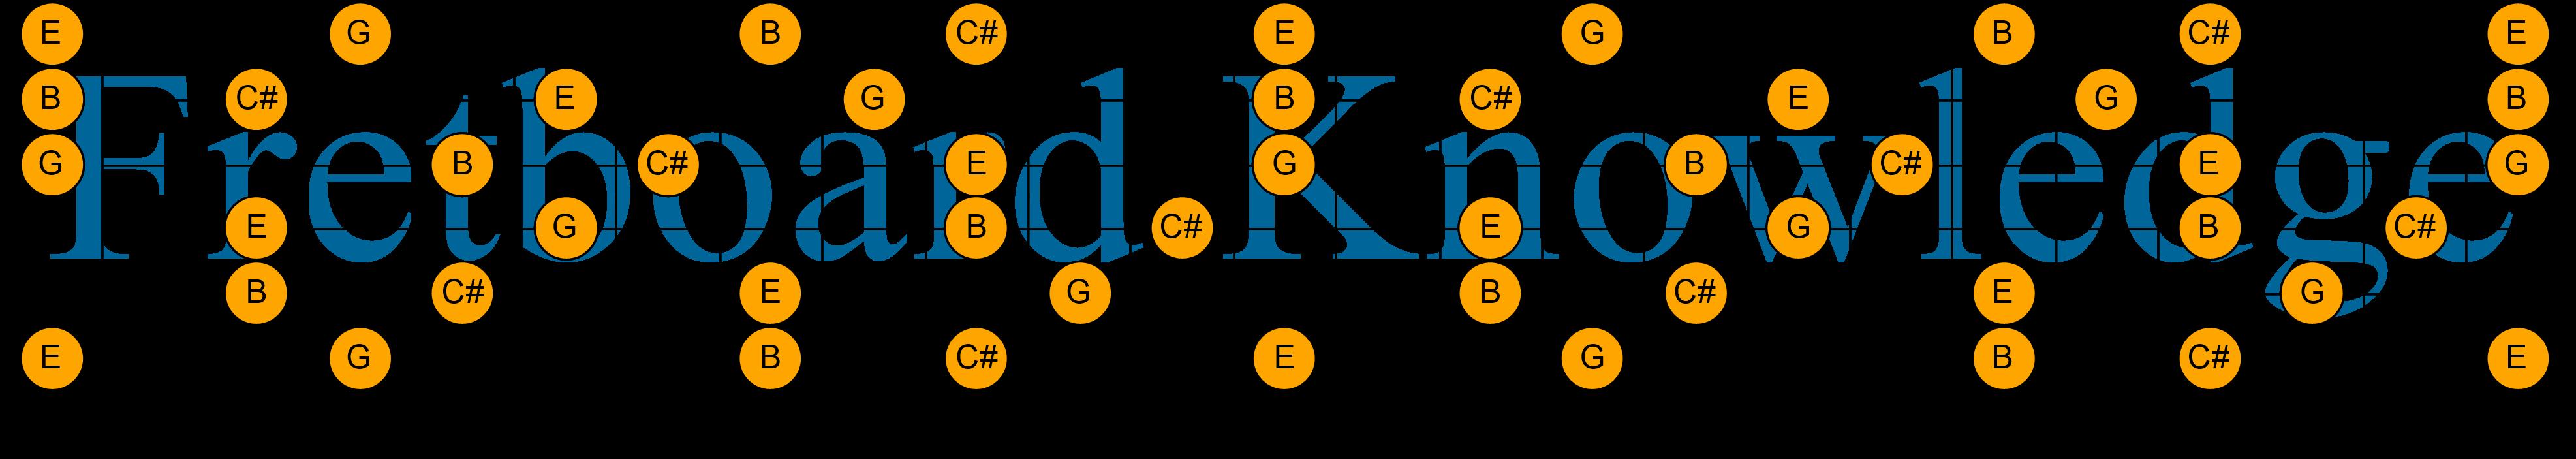 Db Half Diminished Seventh Guitar Fretboard Knowledge